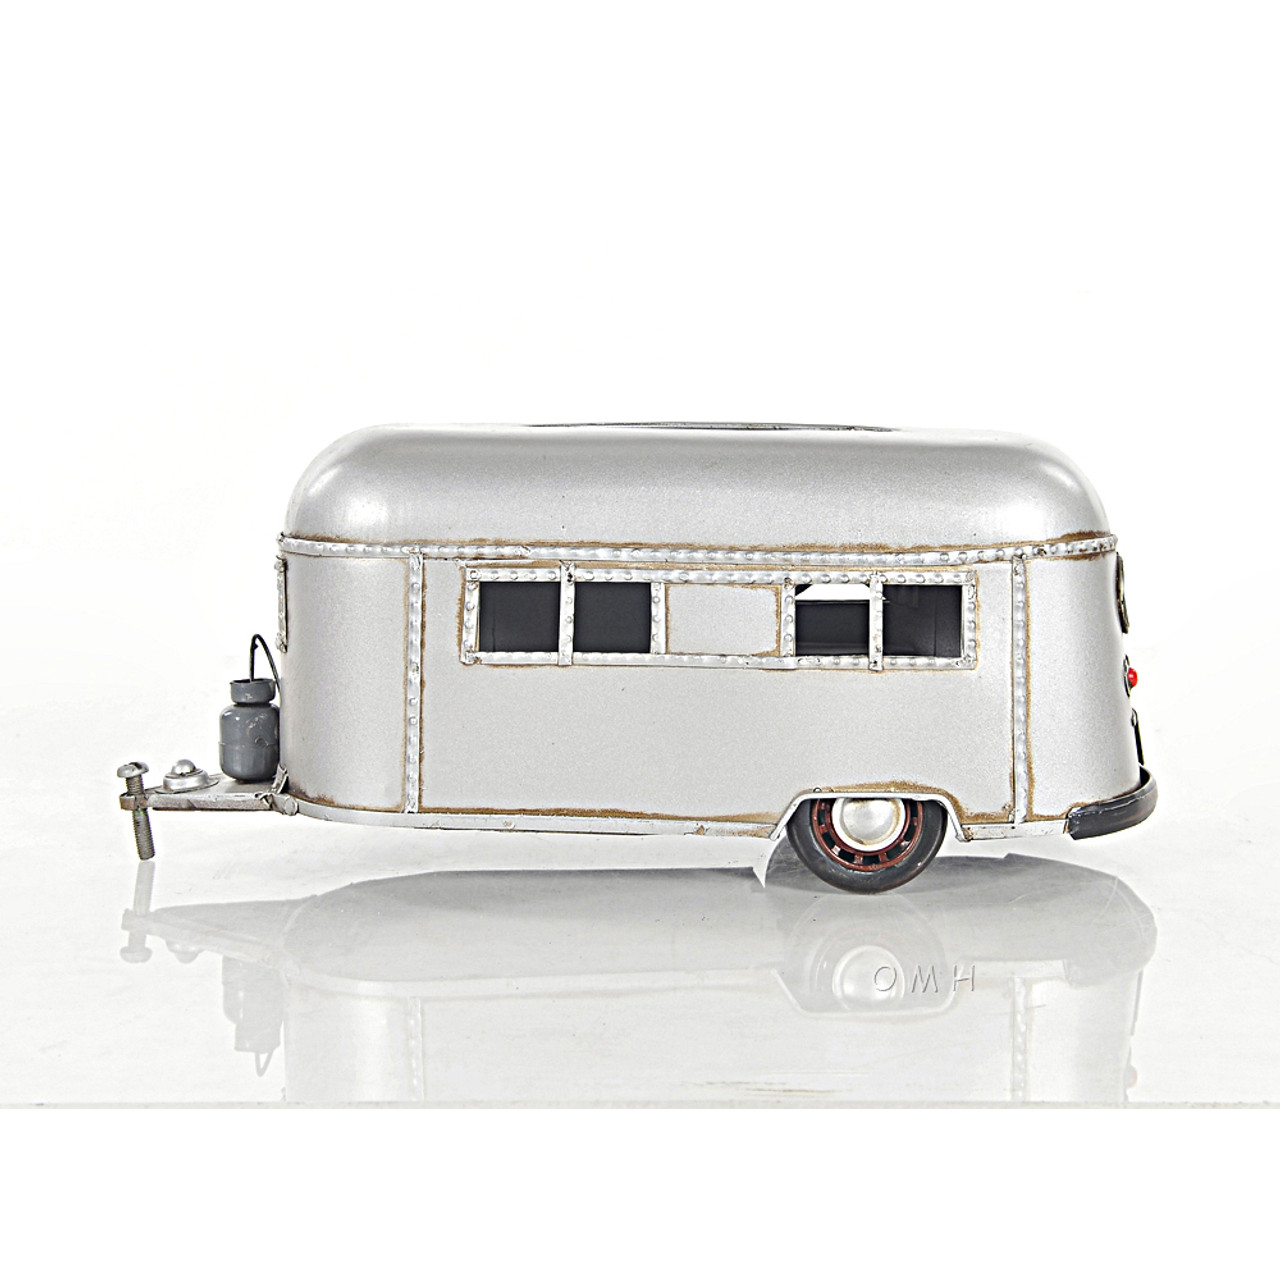 "Rectangular Tissue Holder Travel Camping Trailer Metal Model 12"" Camper"